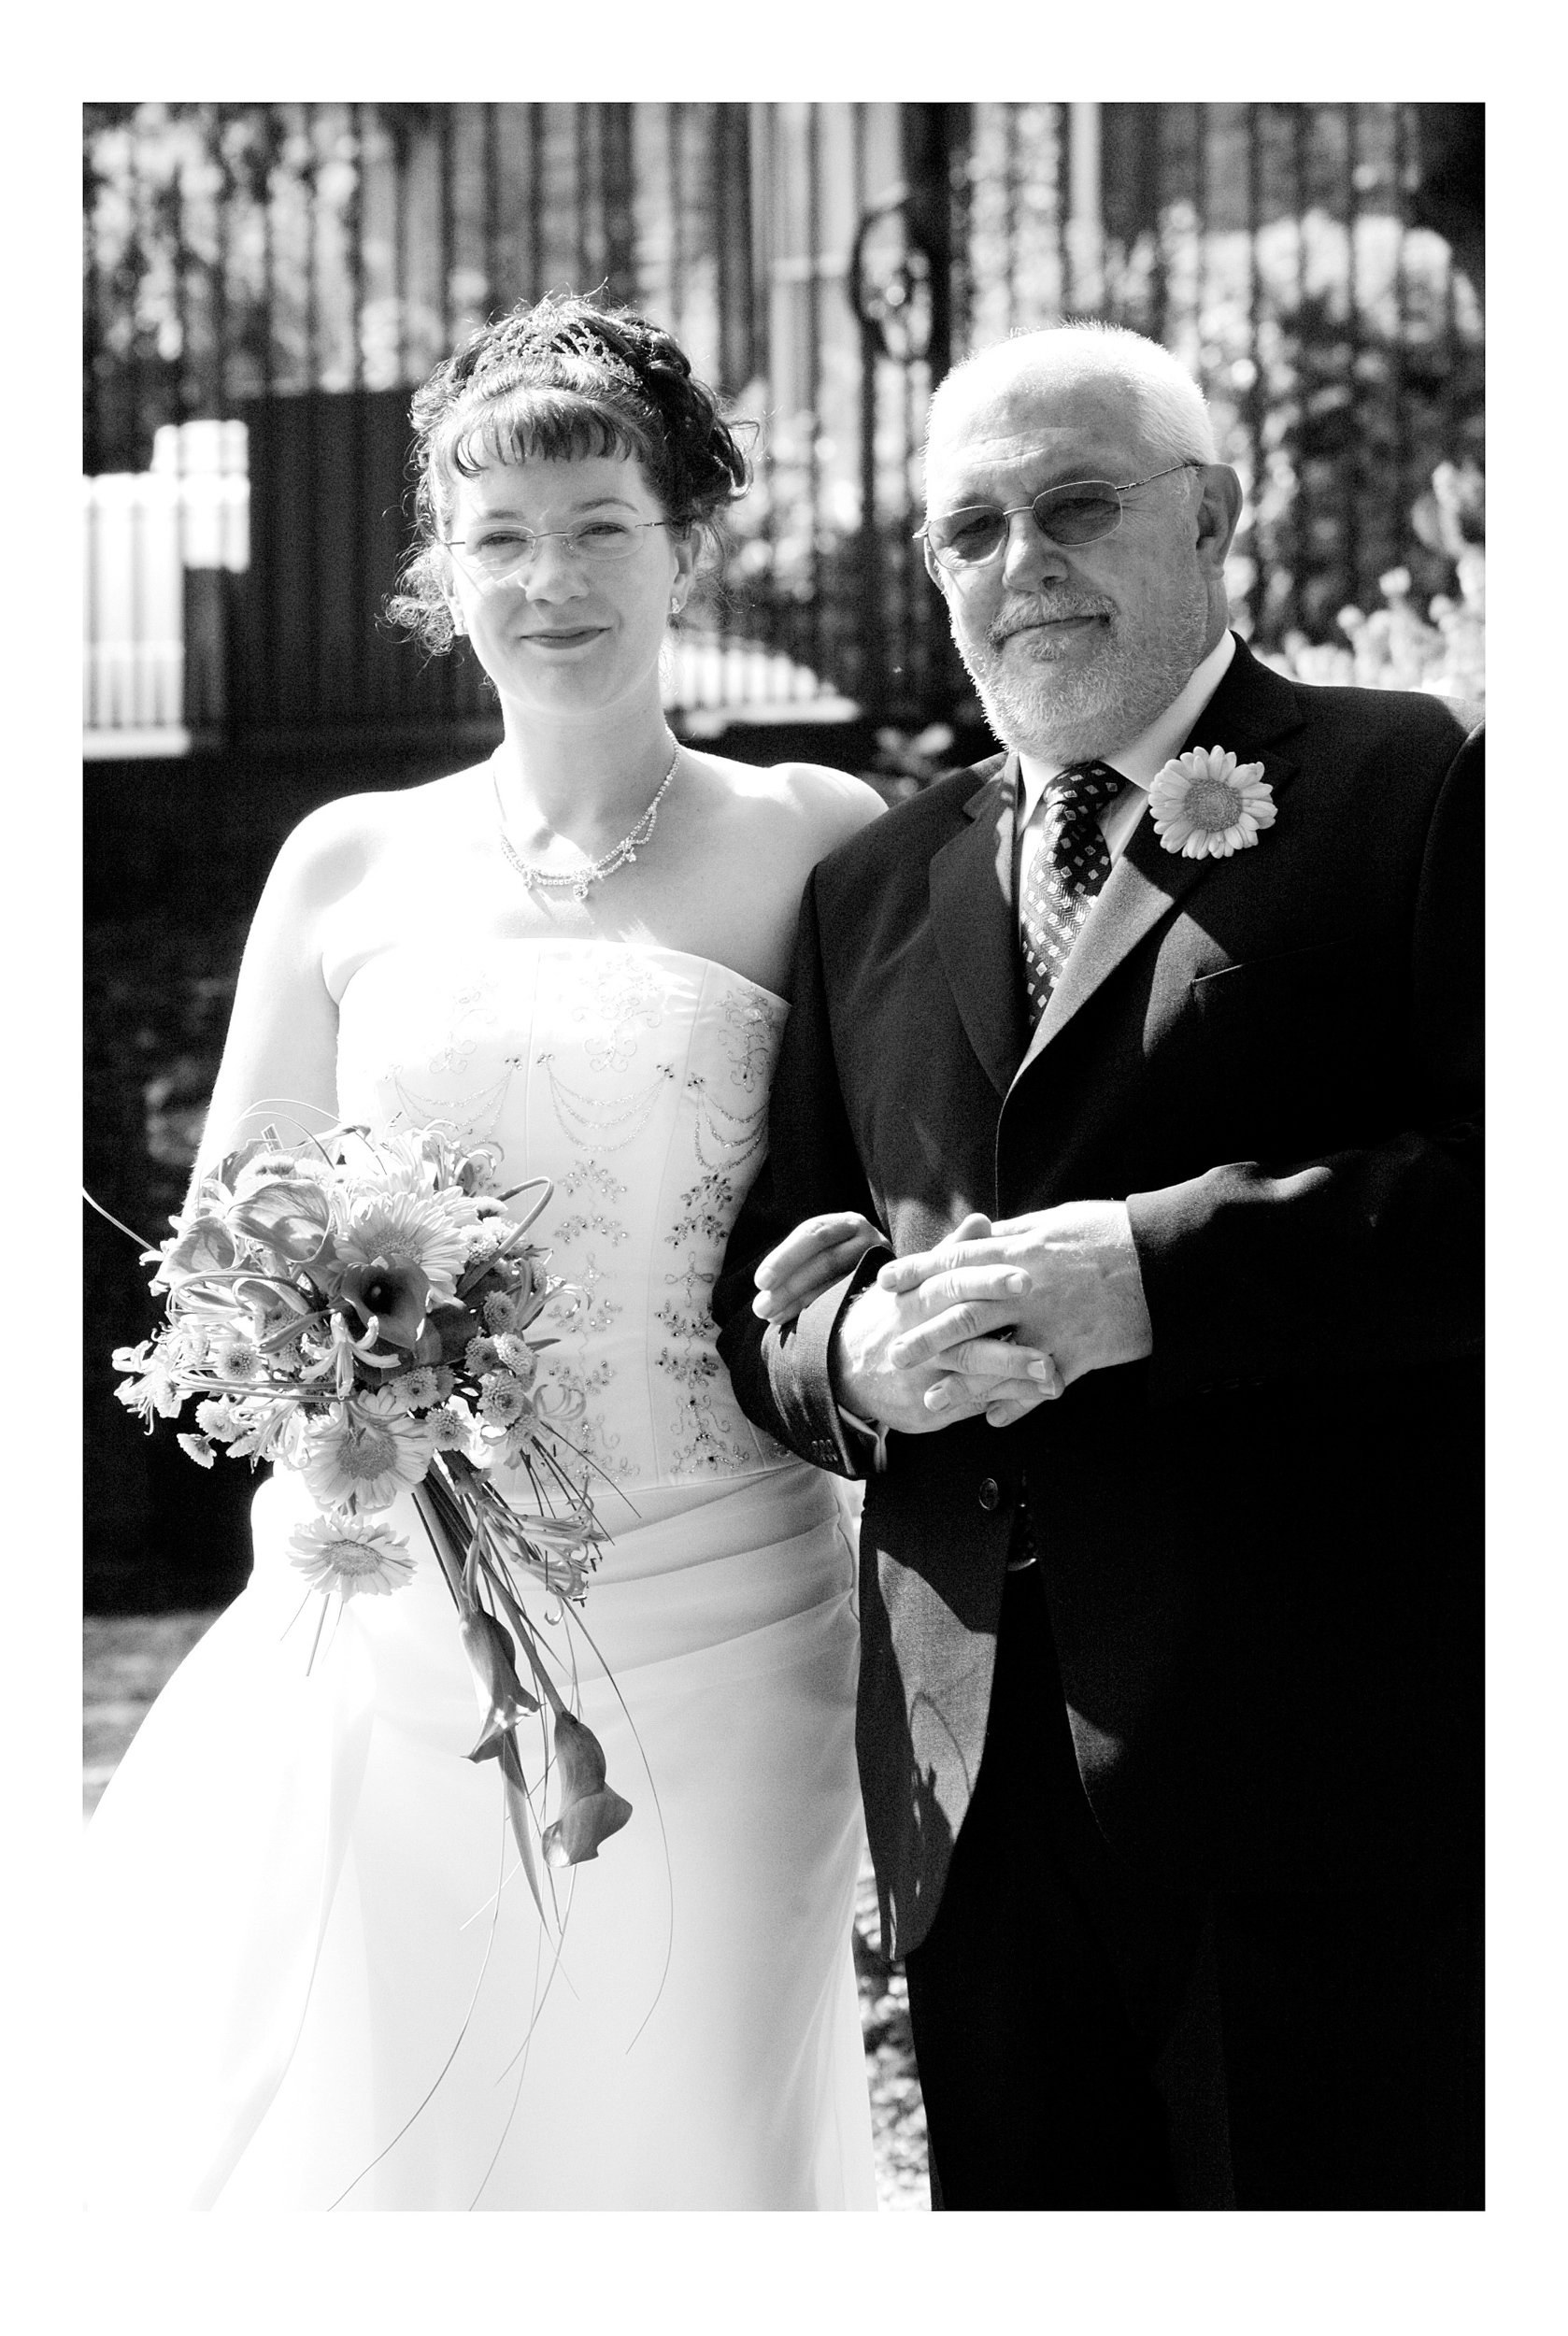 REPORTAGE-WEDDING-PHOTOGRAPHY-SET-UK-3.jpg